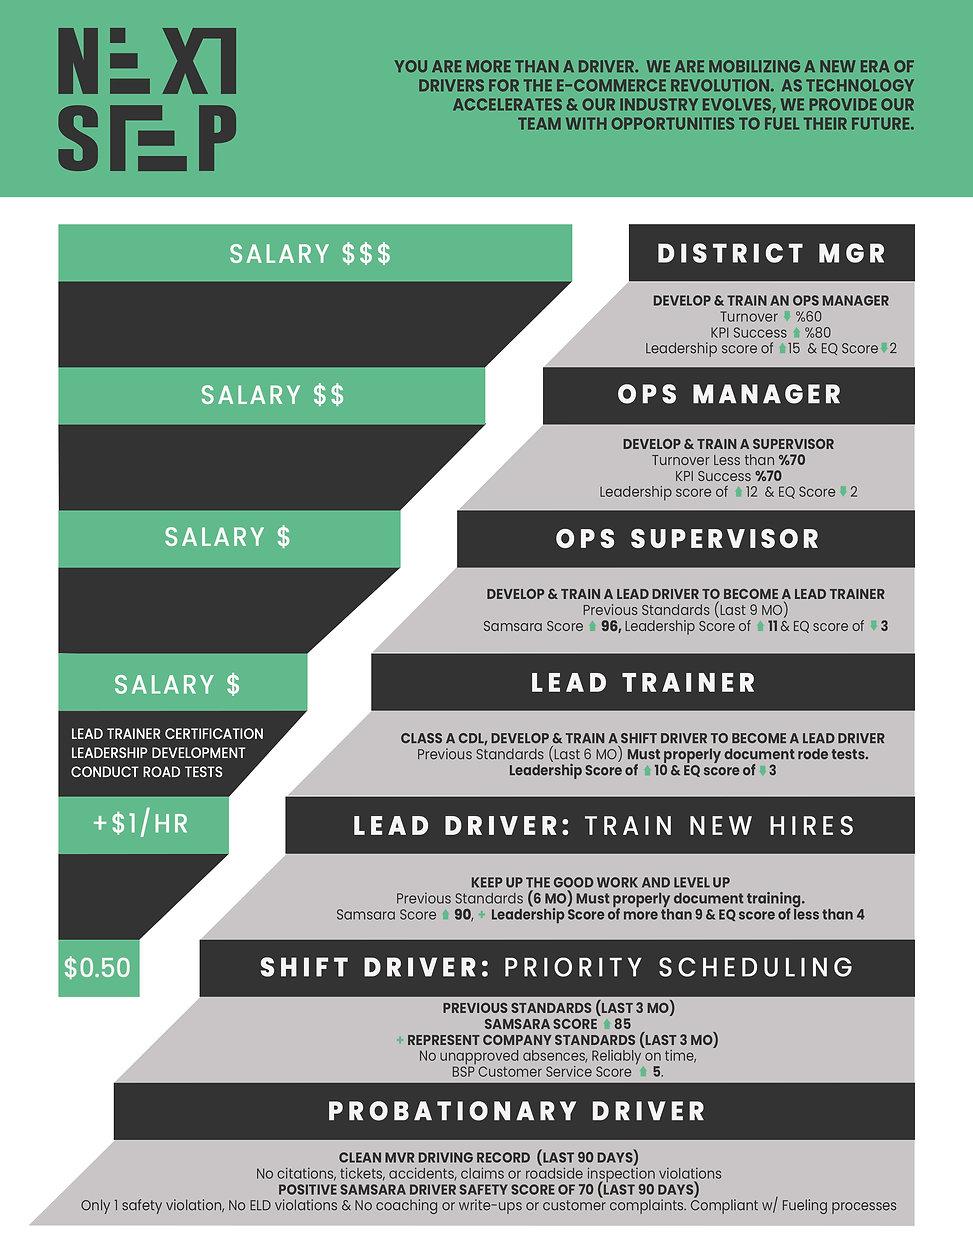 driver advancement infographic.jpg